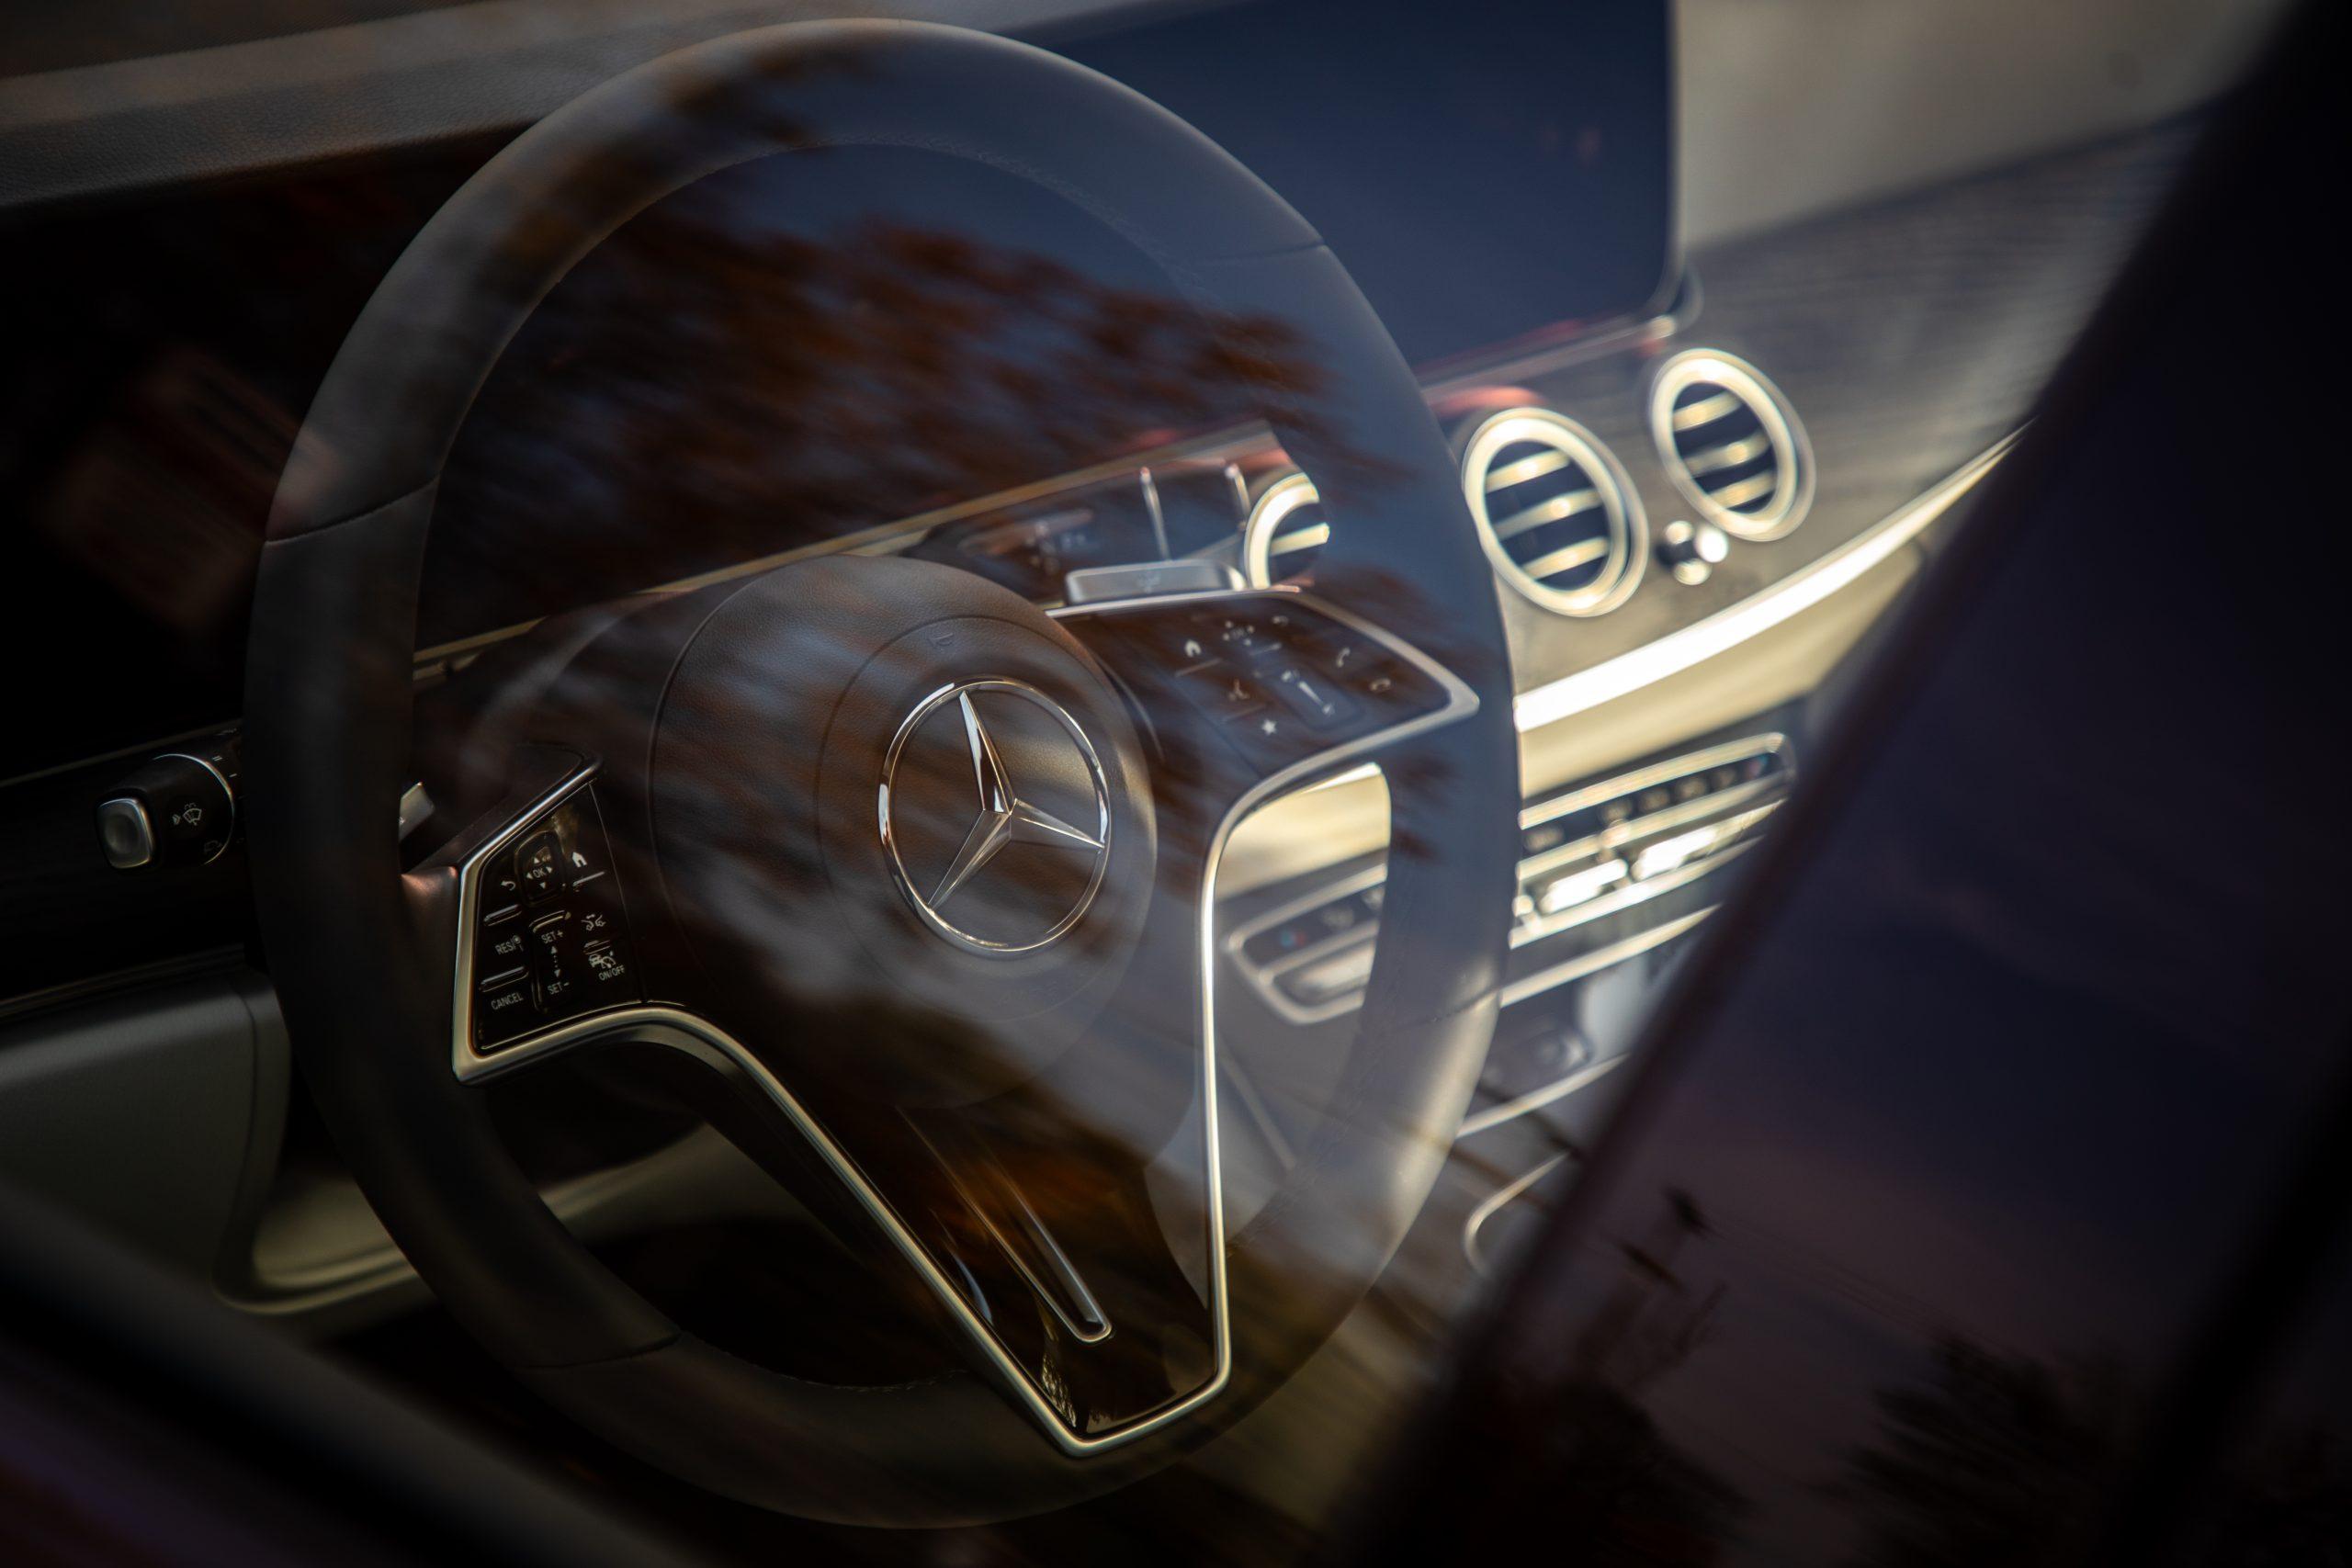 2021 Mercedes Benz E 450 4MATIC steering wheel